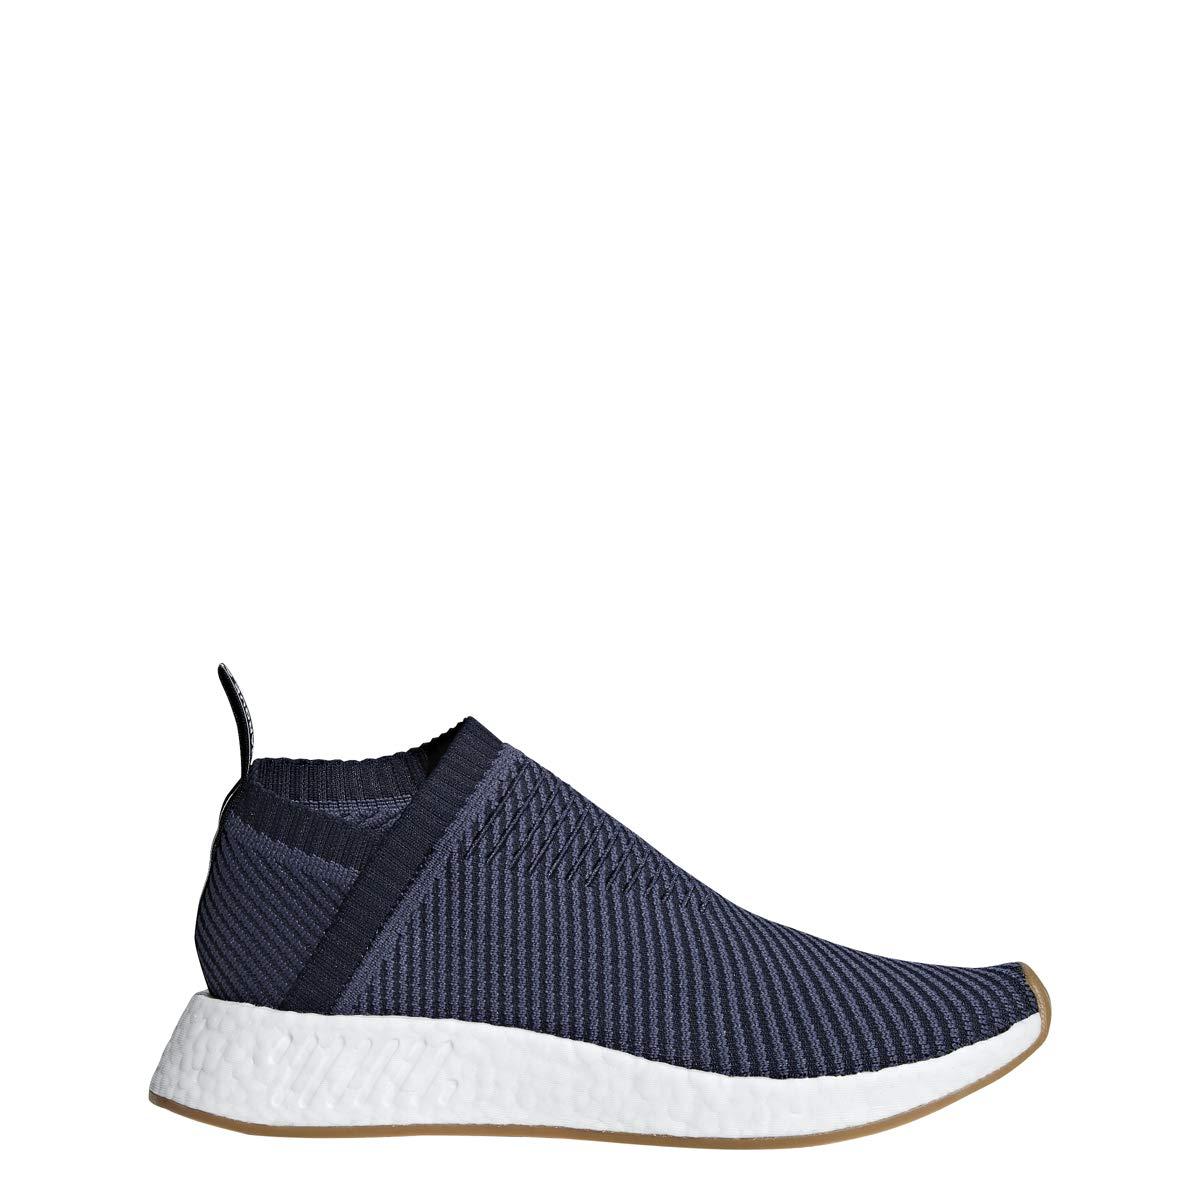 Adidas NMD CS2 Primeknit Blue, Men's Fashion, Footwear